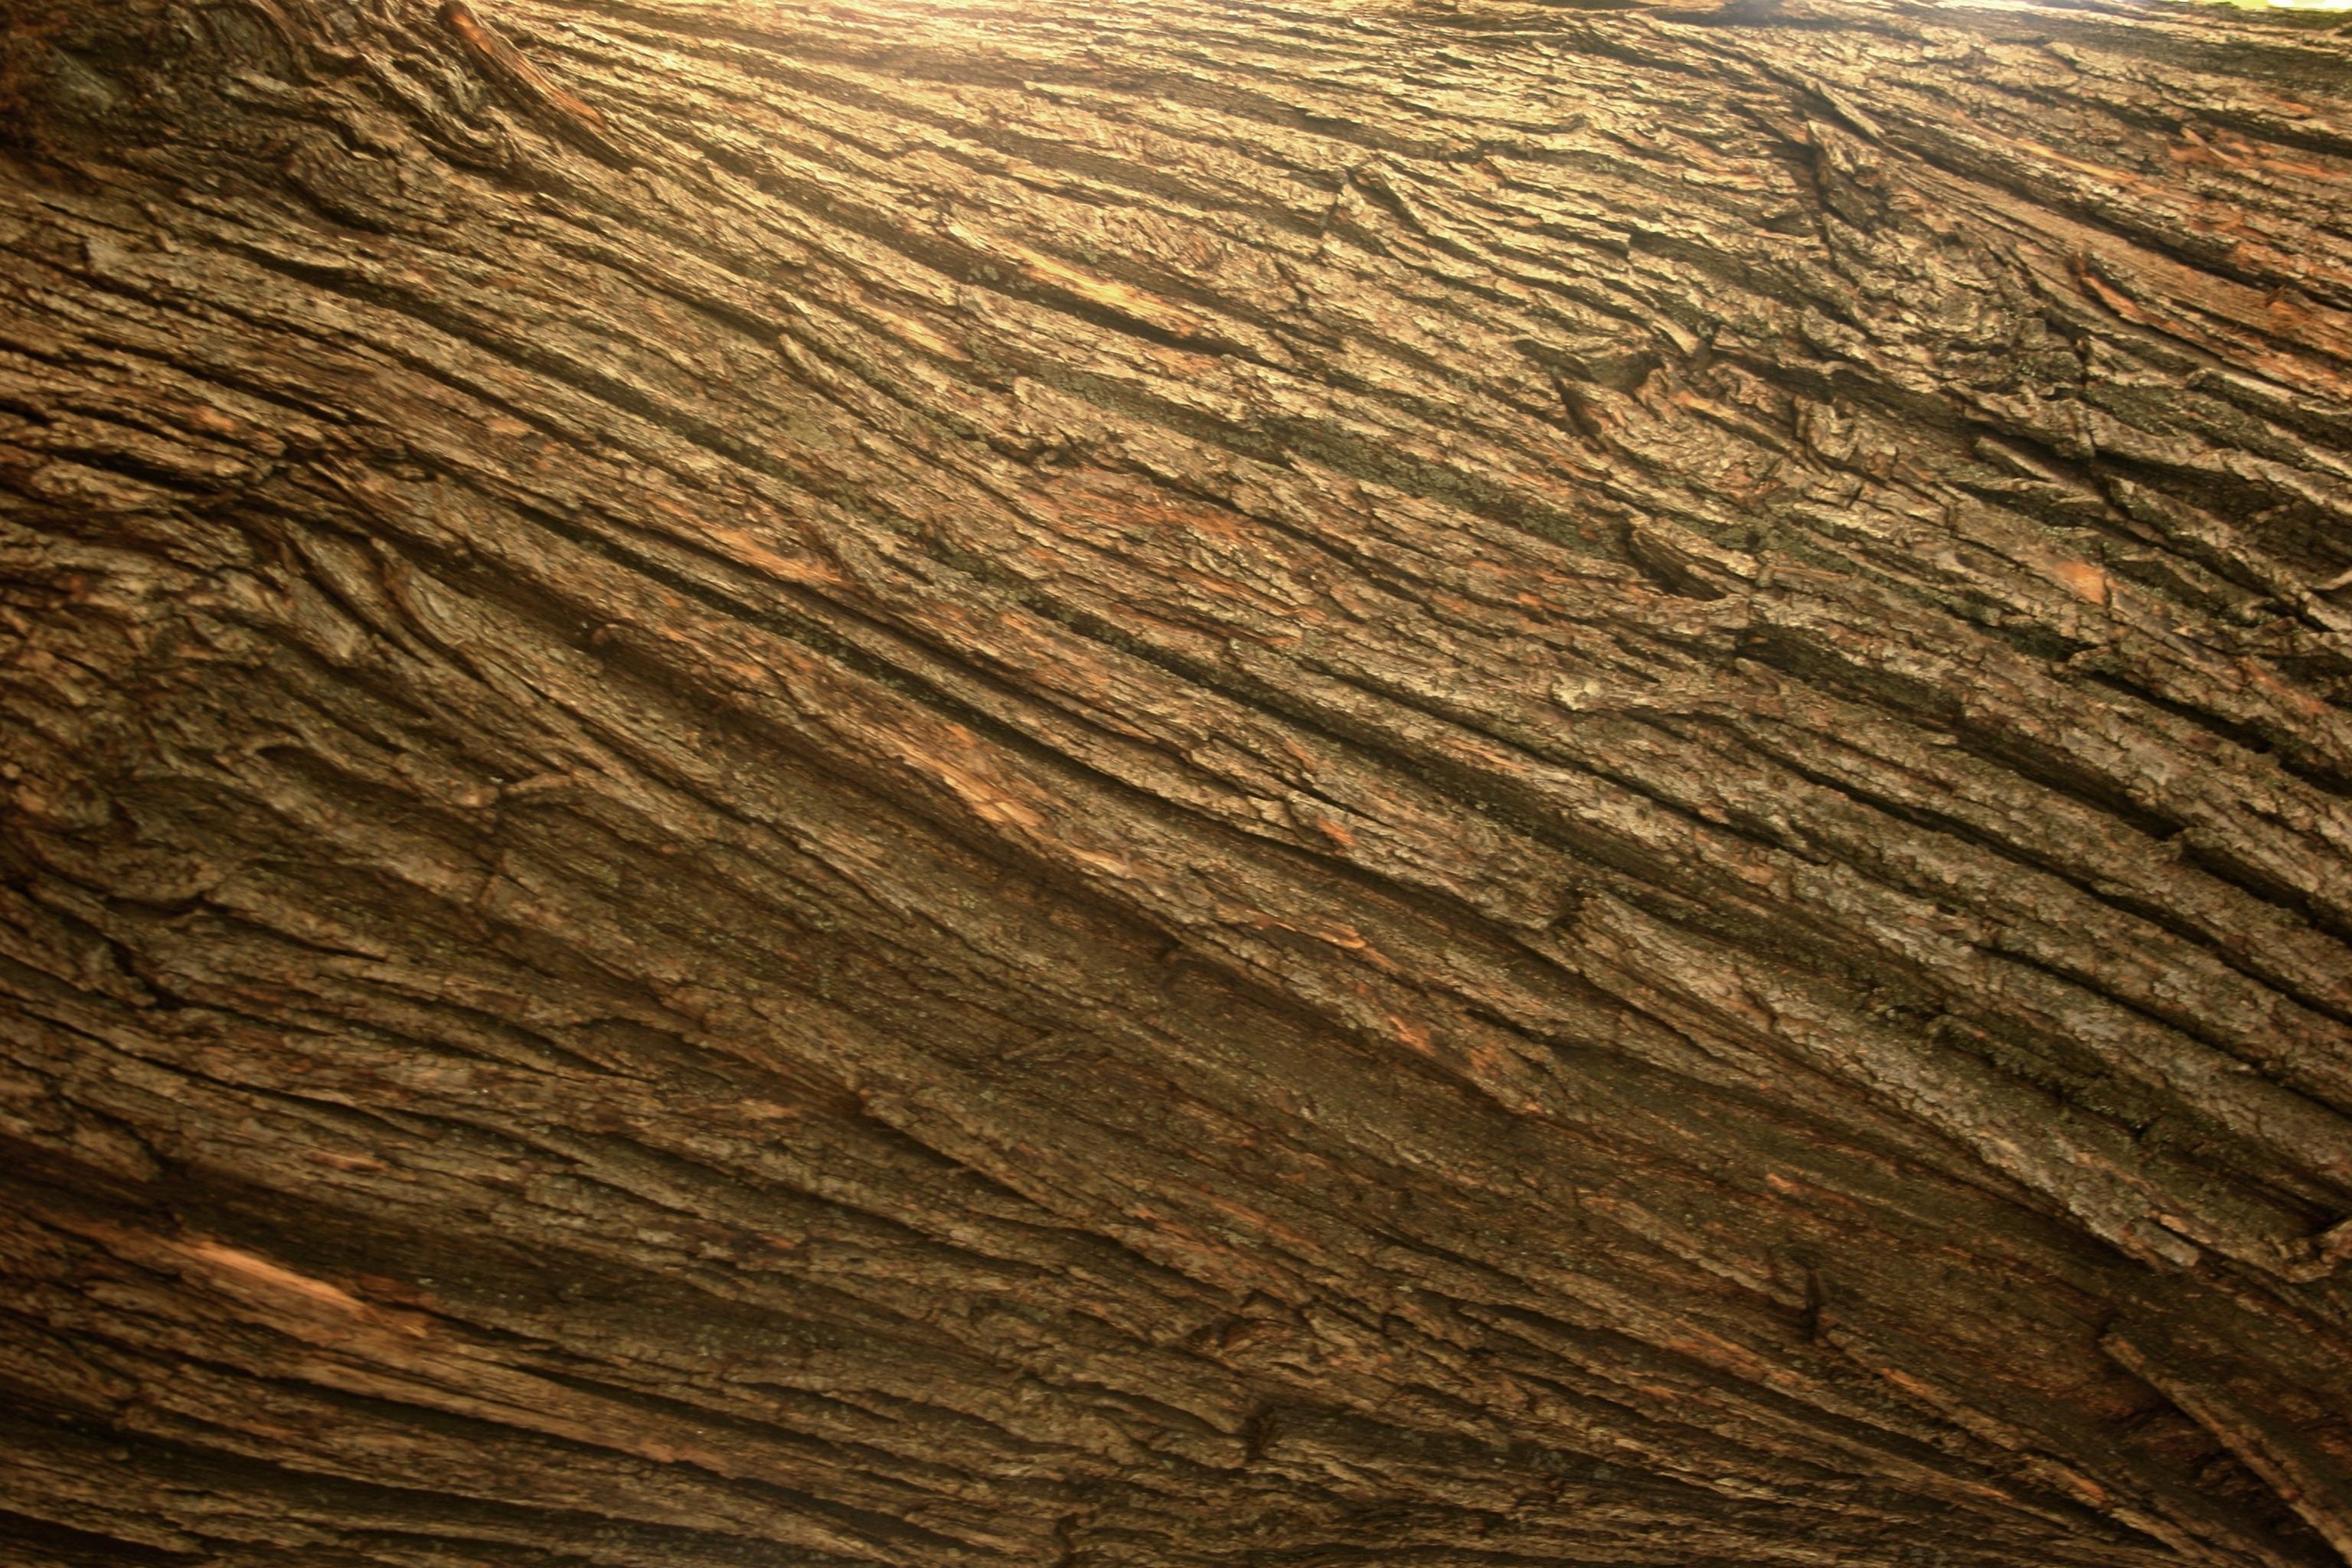 Laminat textur hd  Kostenlose foto : Baum, Natur, Rock, Holz, Textur, Stock ...